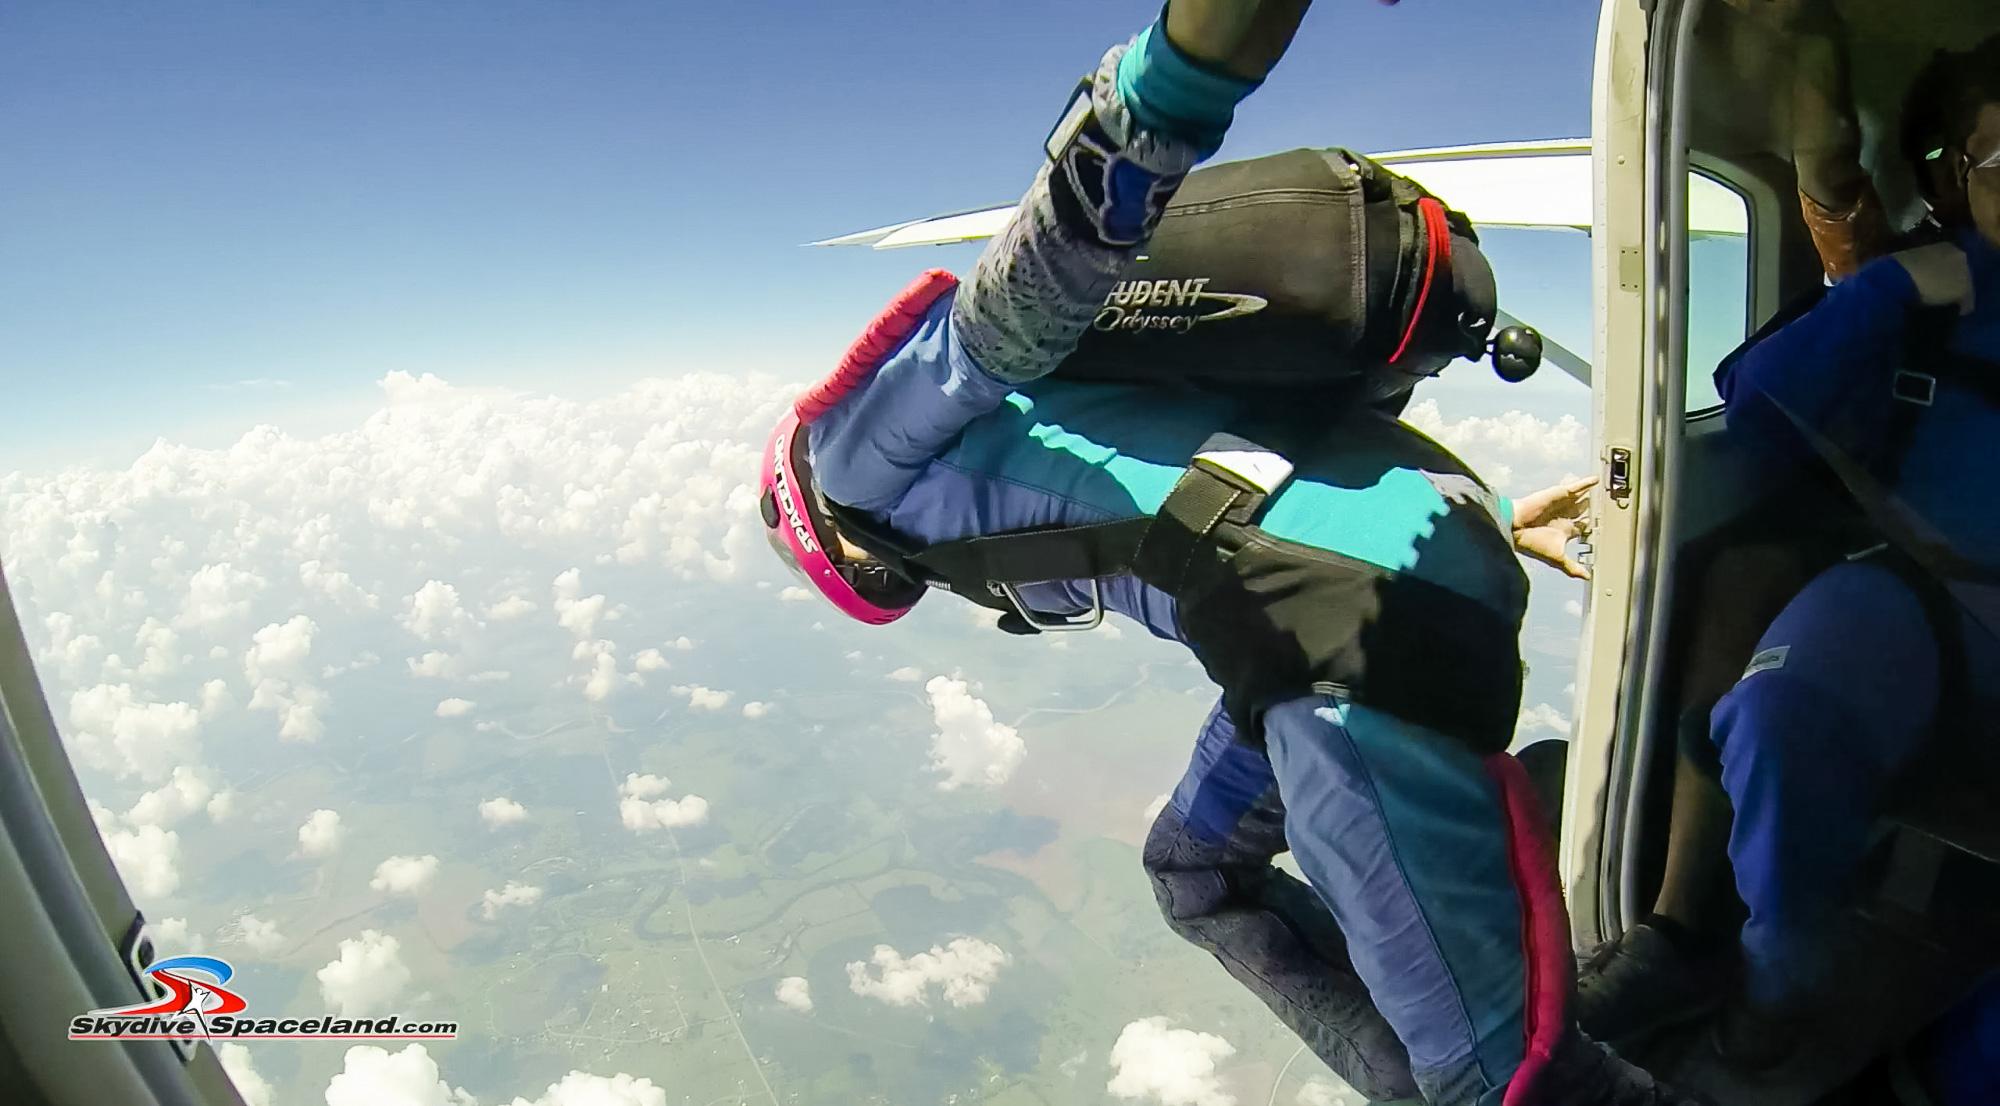 Skydiving Day-Video Screenshots-0016.jpg